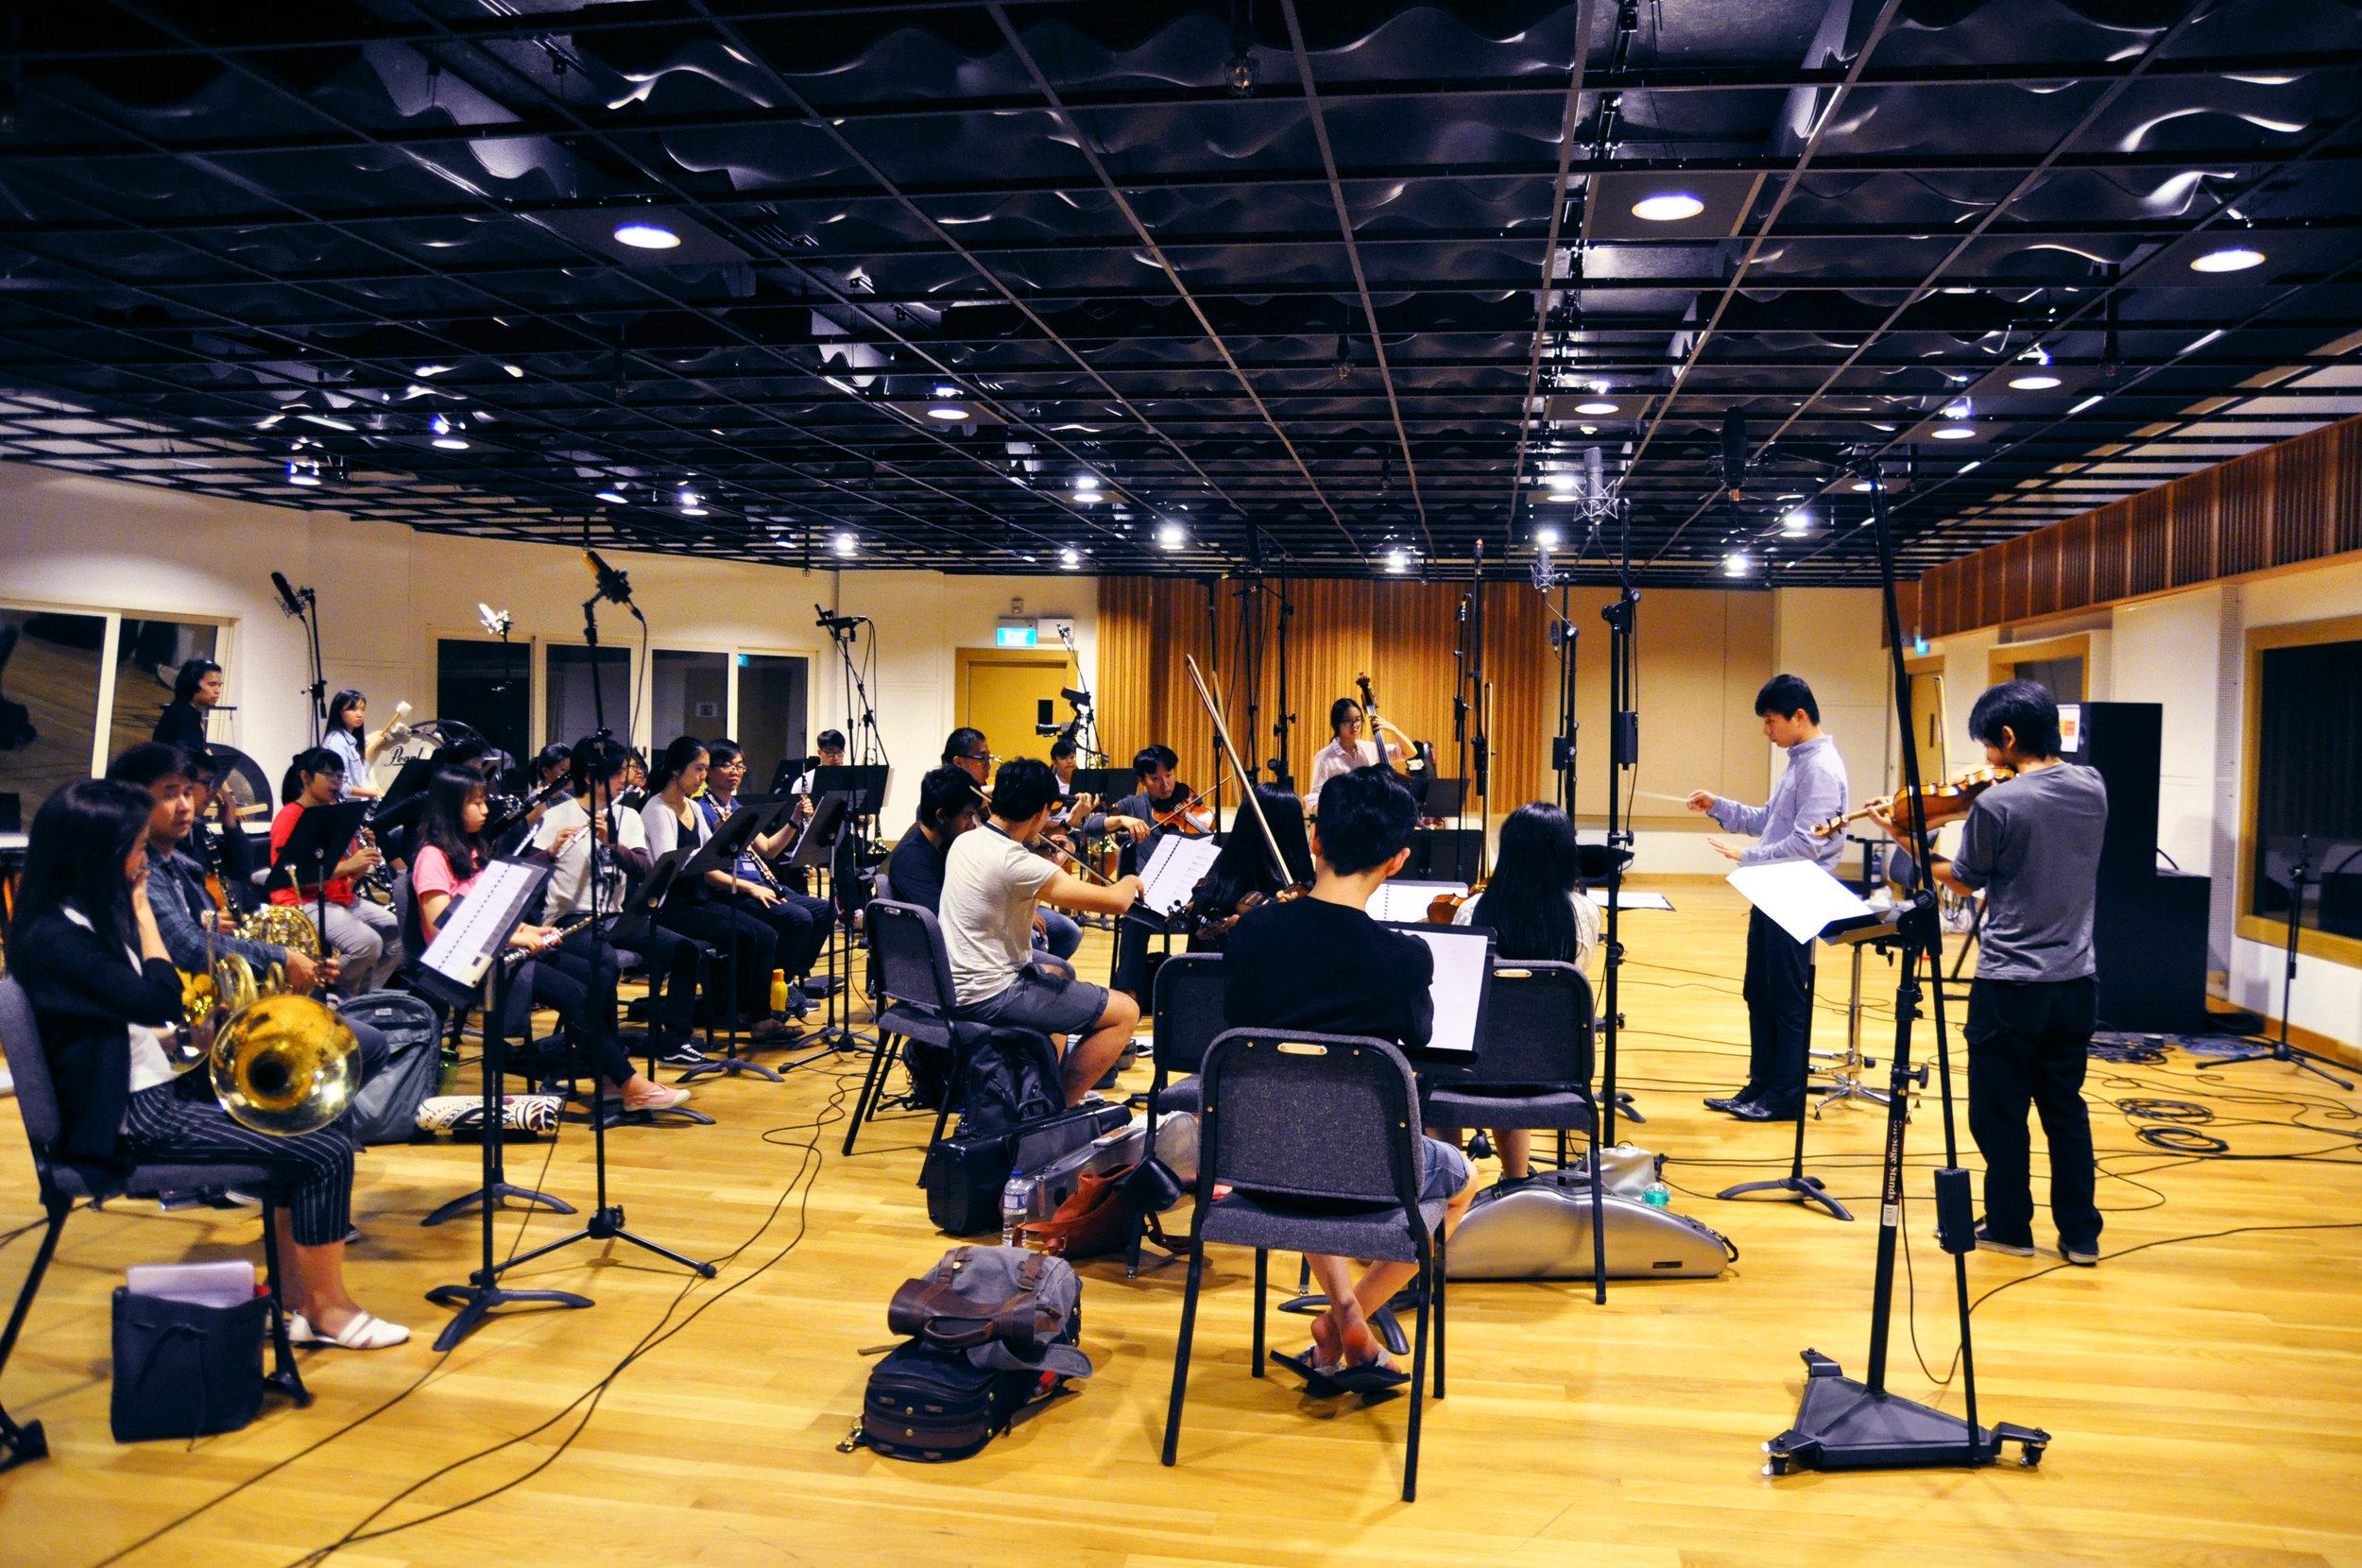 Recording Studio (Myanmar Project)